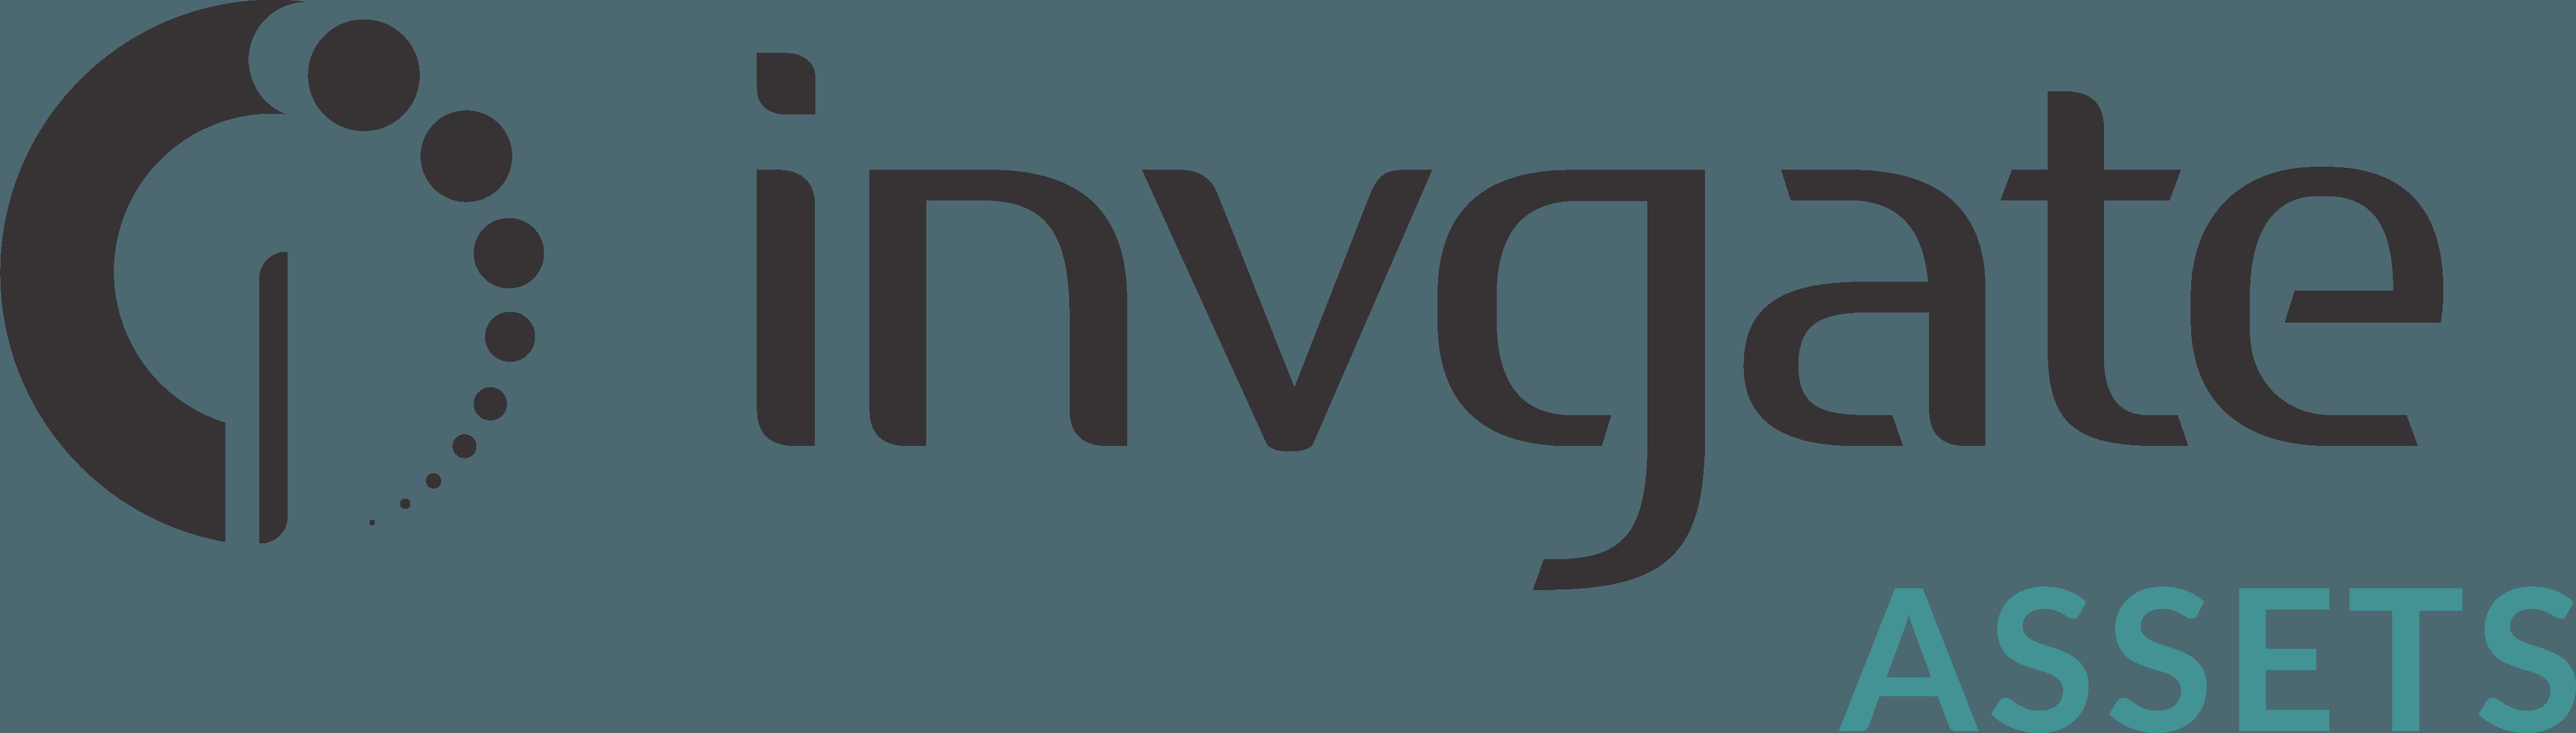 InvGate Assets logo